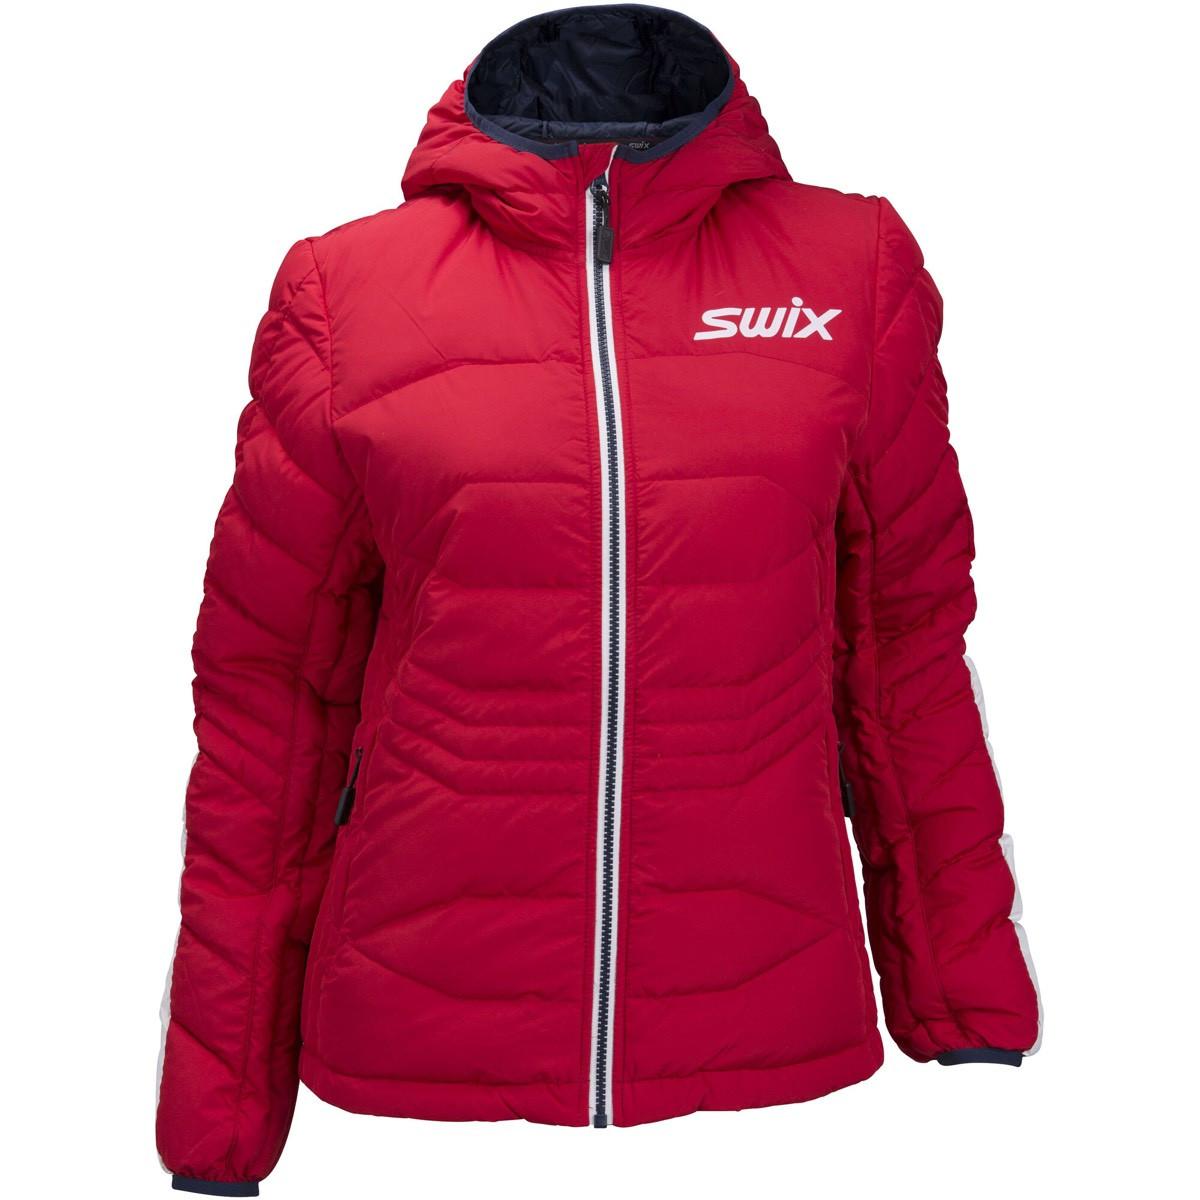 Swix Dynamic Down Jacket Women's Red